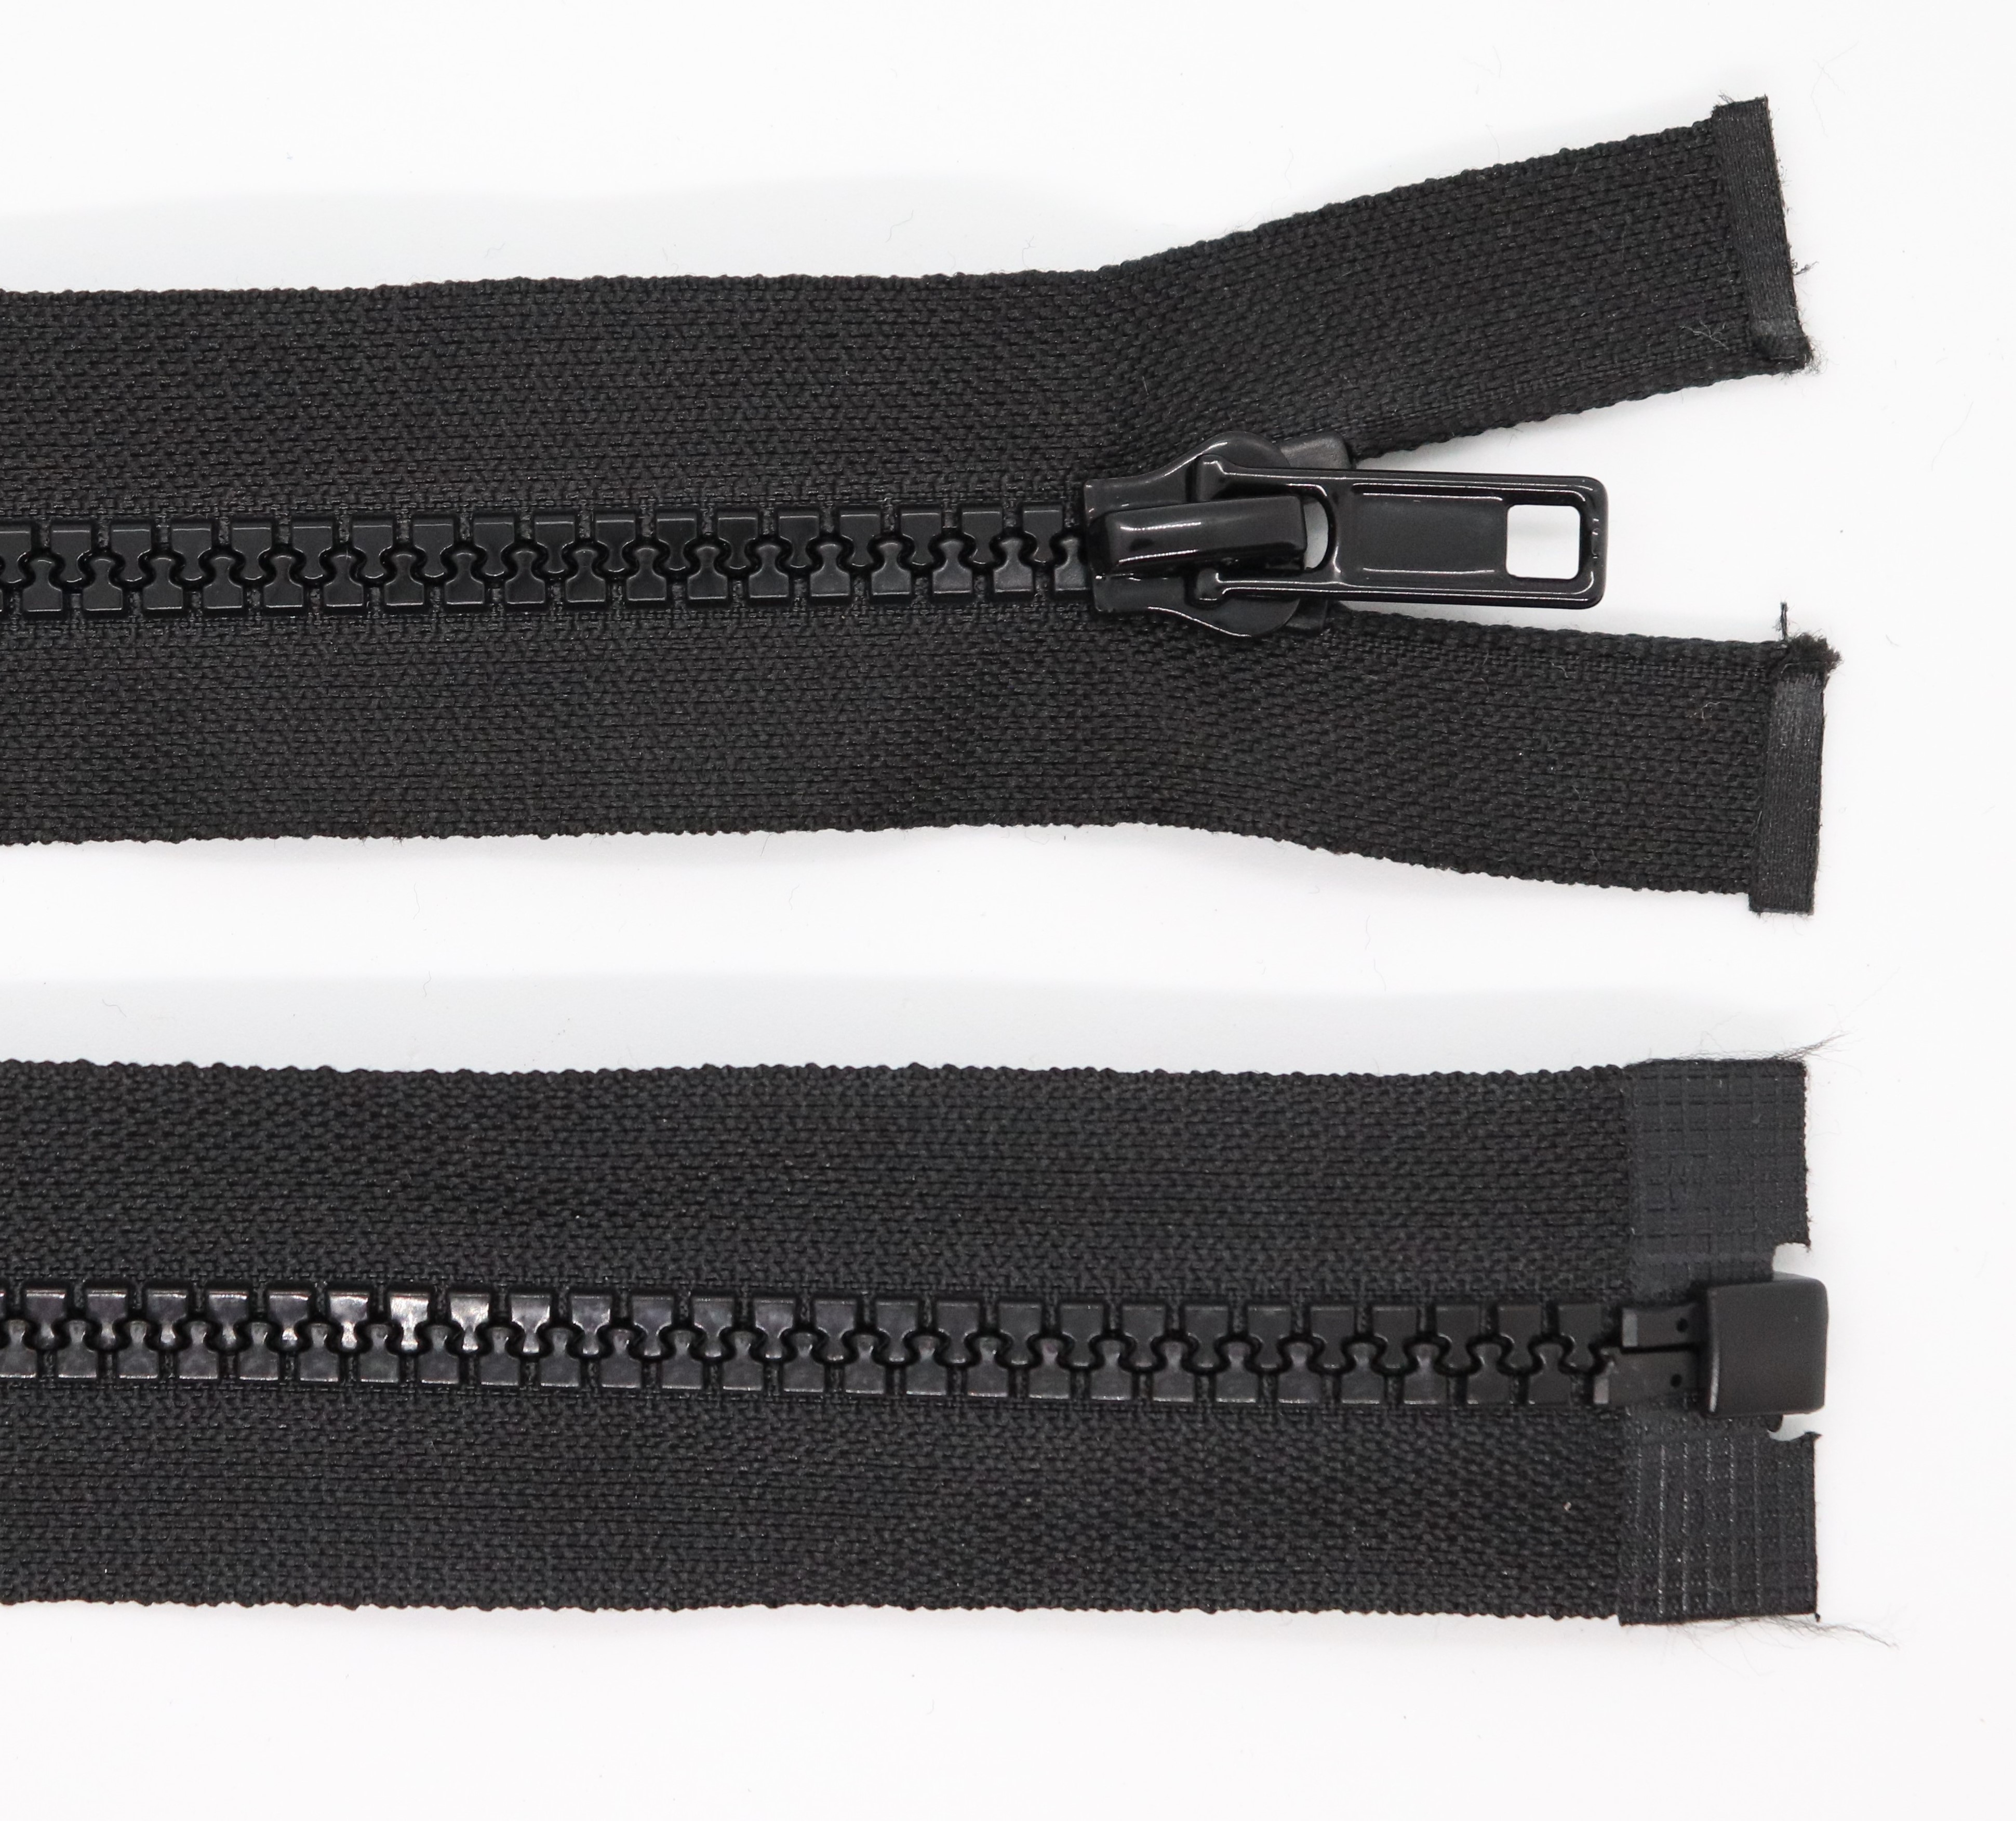 Kostìný zip šíøe 5 mm délka 65 cm dìlitelný - zvìtšit obrázek